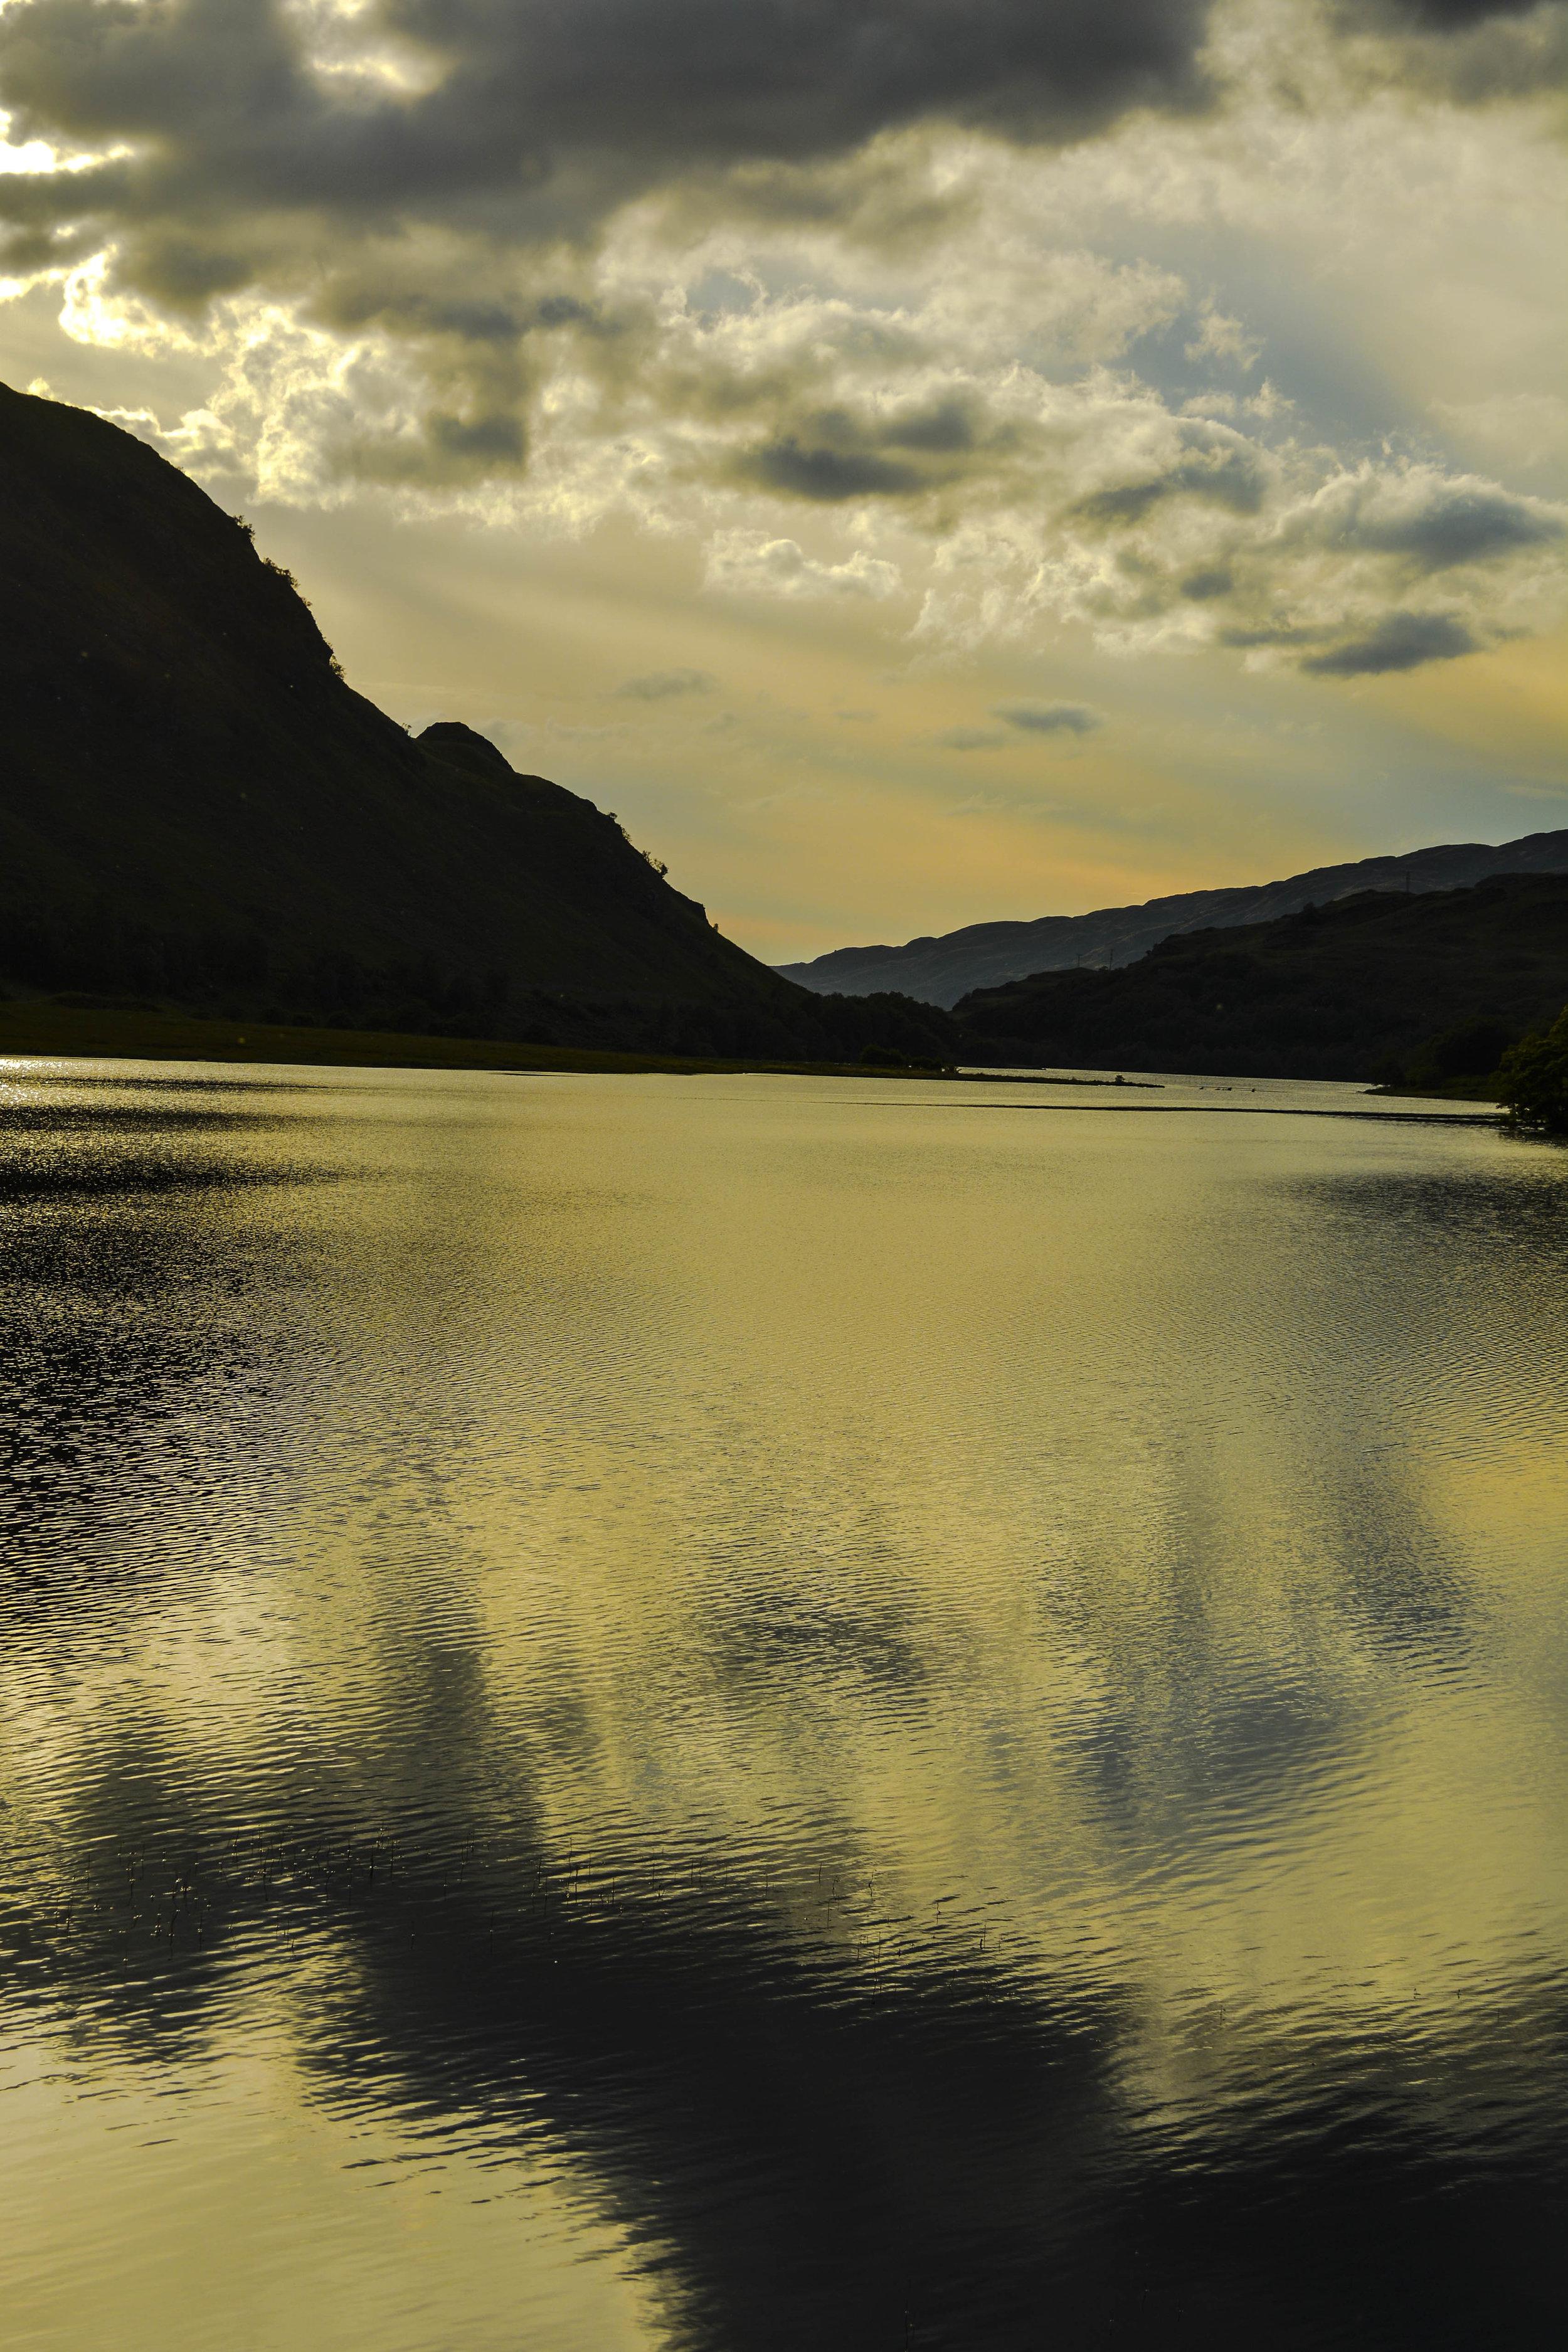 Loch Yin & Yang, 24 x 36, photo on metal